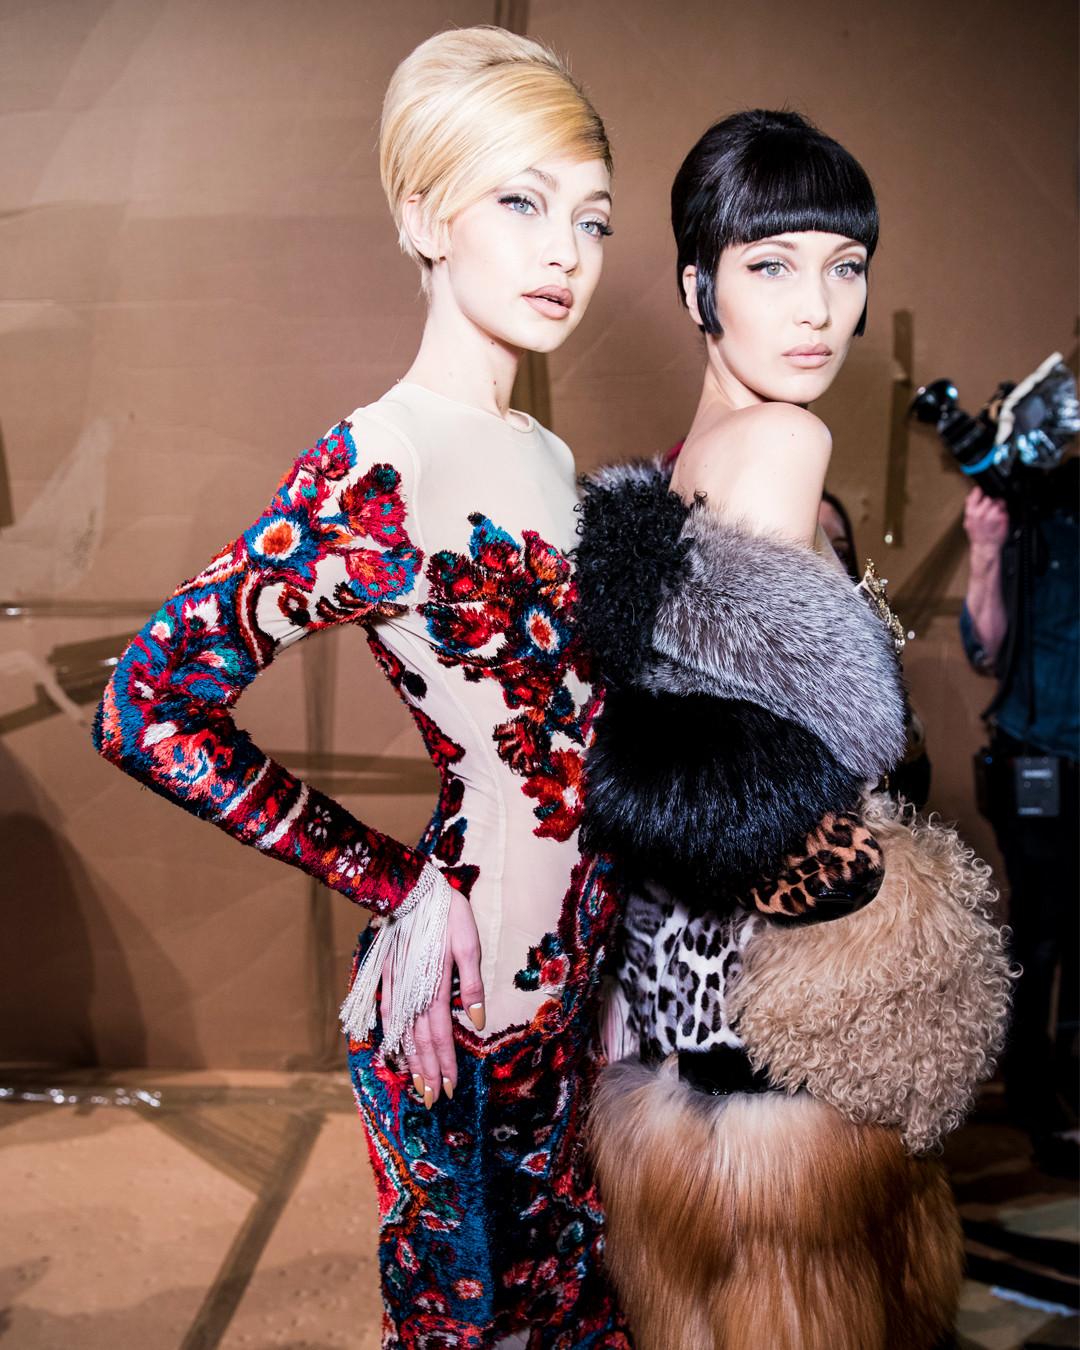 Gigi and Bella Hadid's Most Stylish Sister Moments